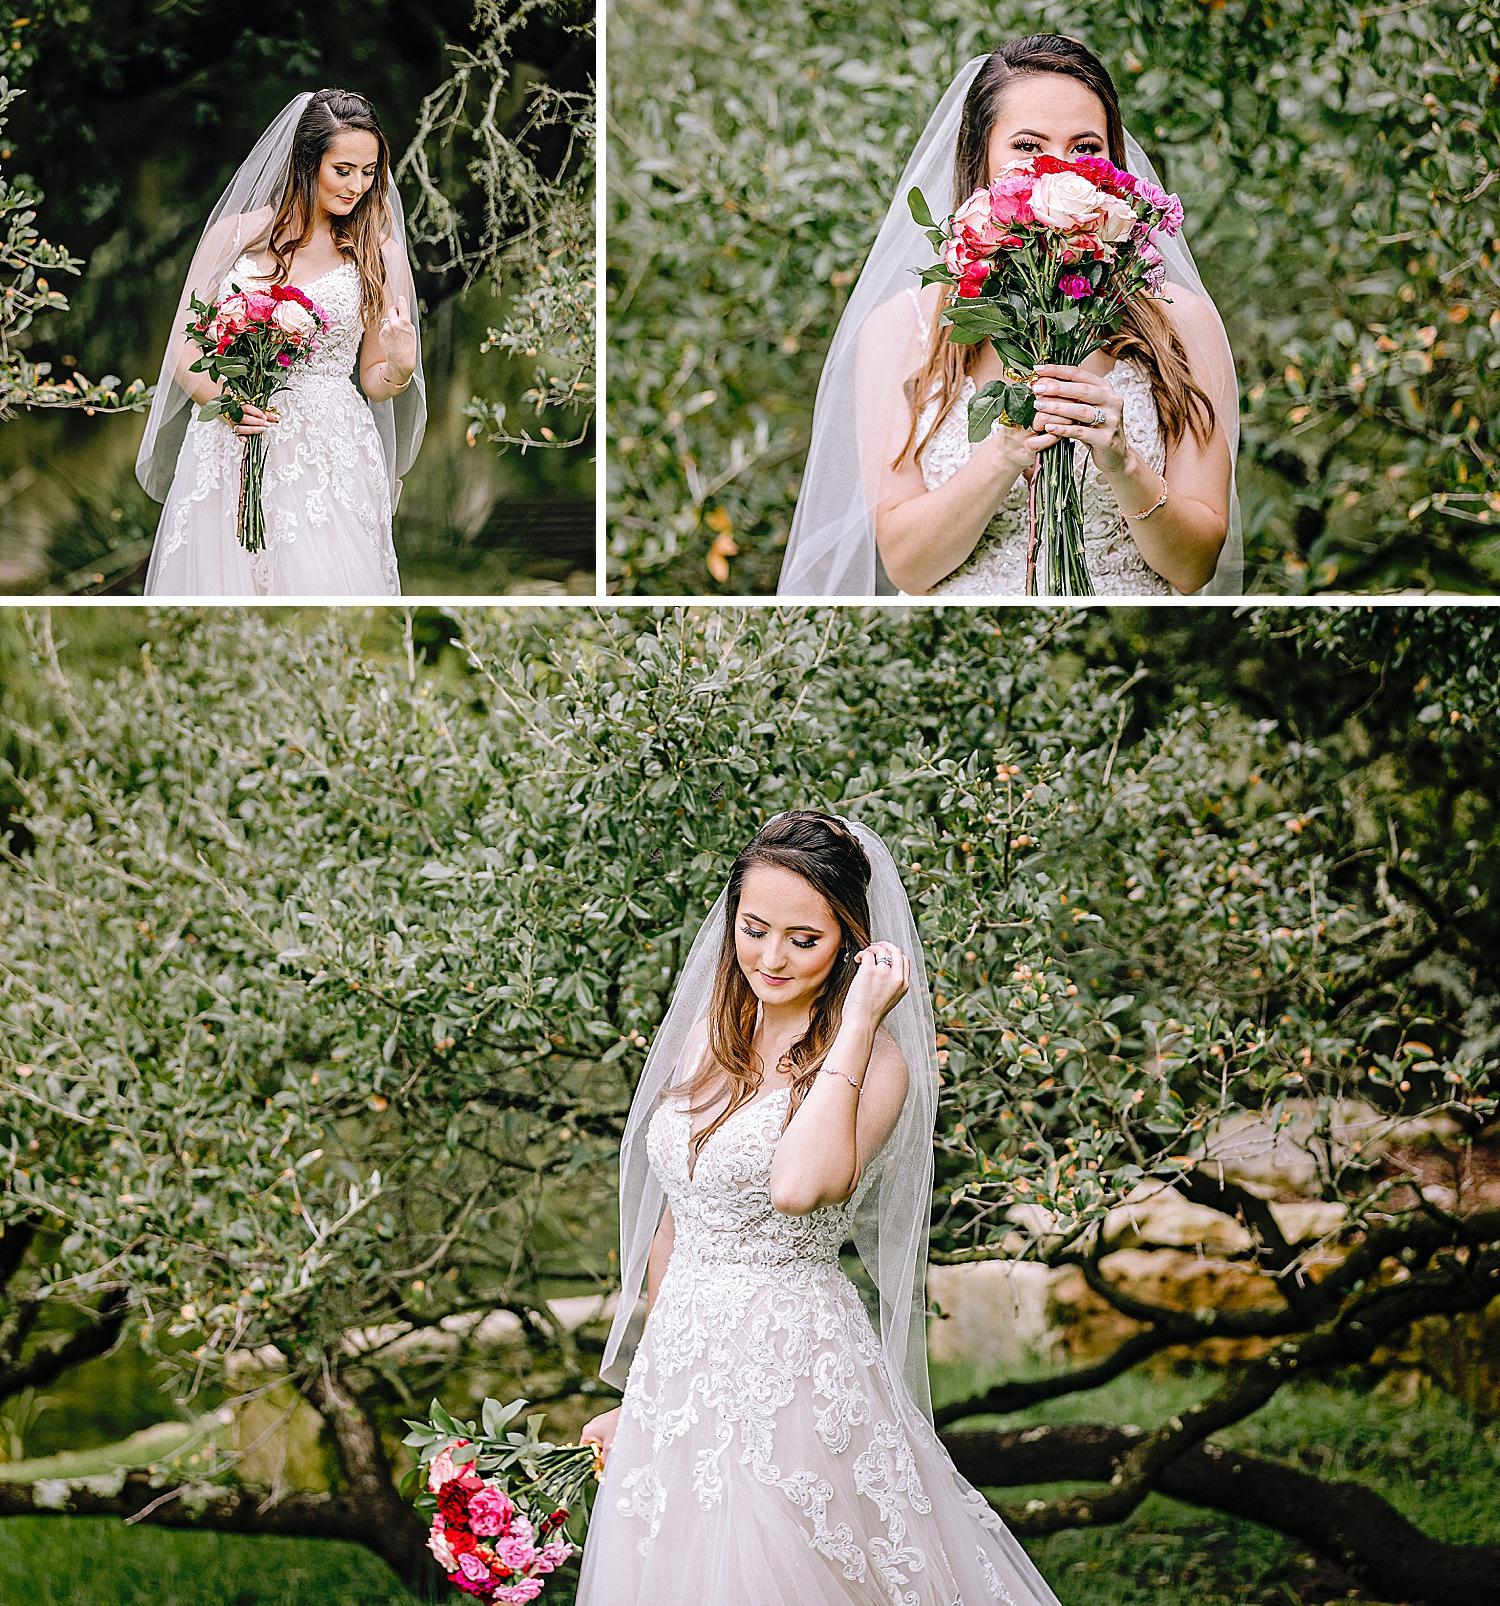 Carly-Barton-Photography-Bridal-Photos-Remis-Ridge-Hidden-Falls-New-Braunfels-Texas-Bride_0015.jpg